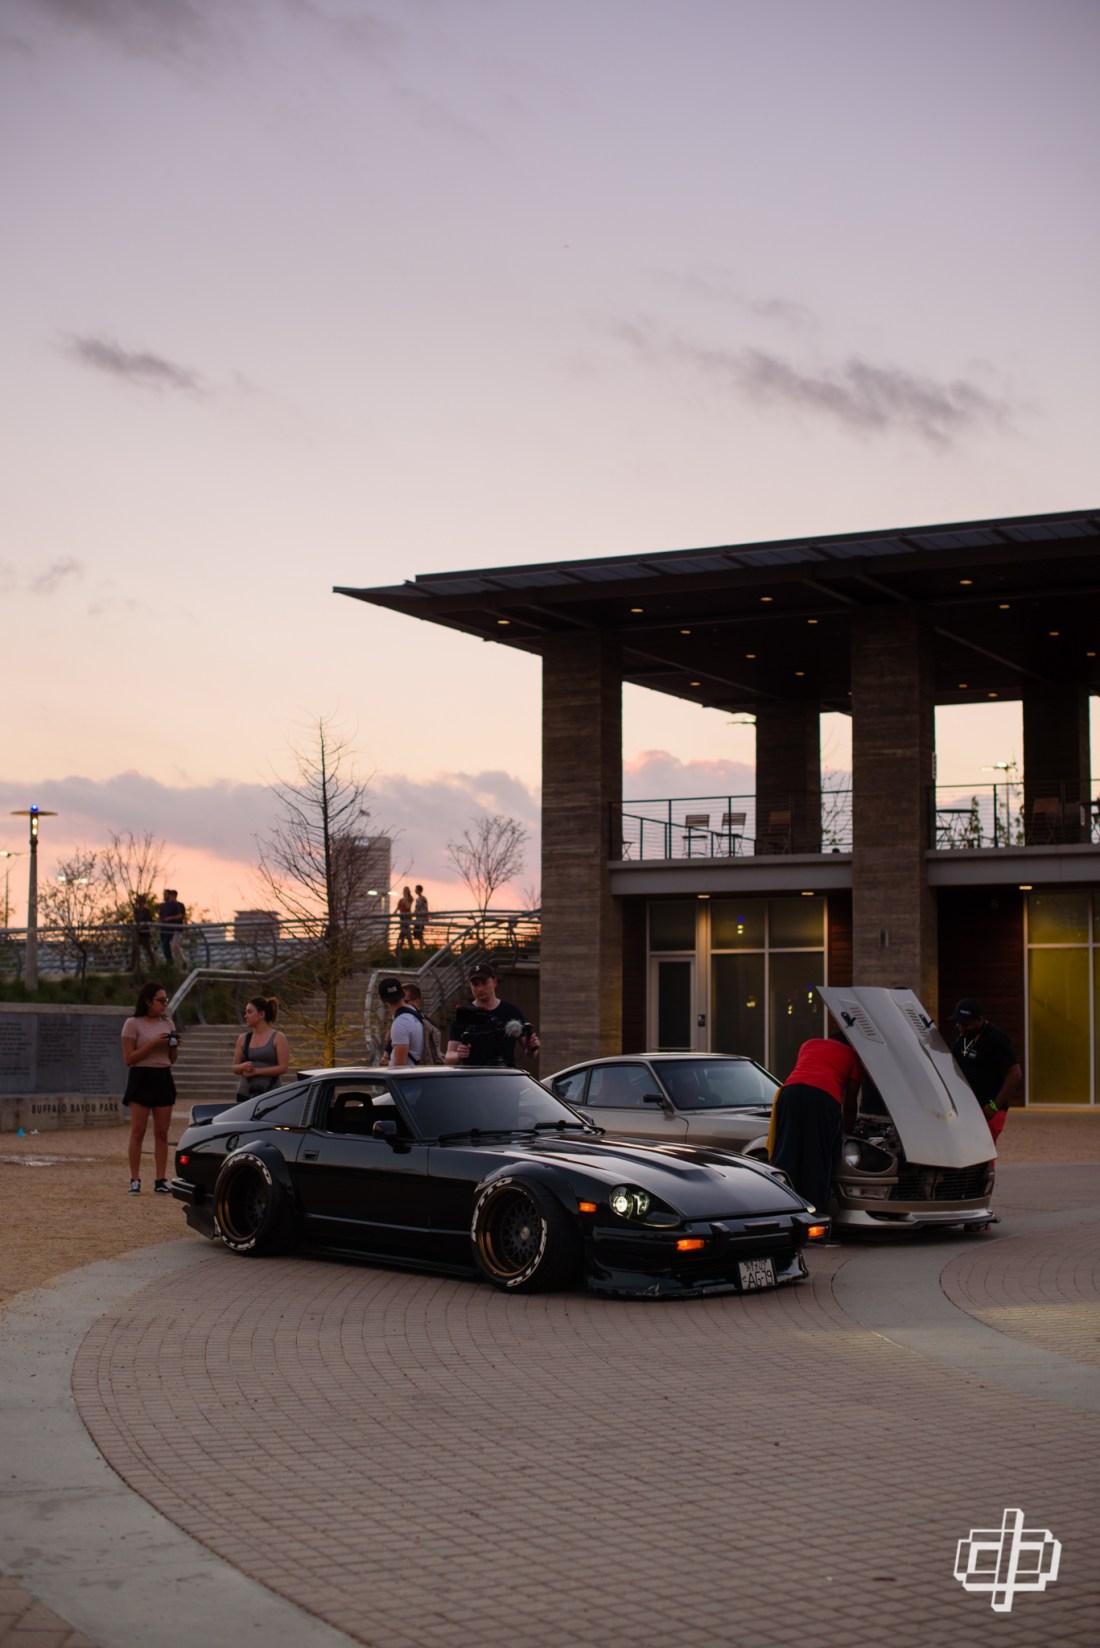 280z s30 Z final formation houston car meets